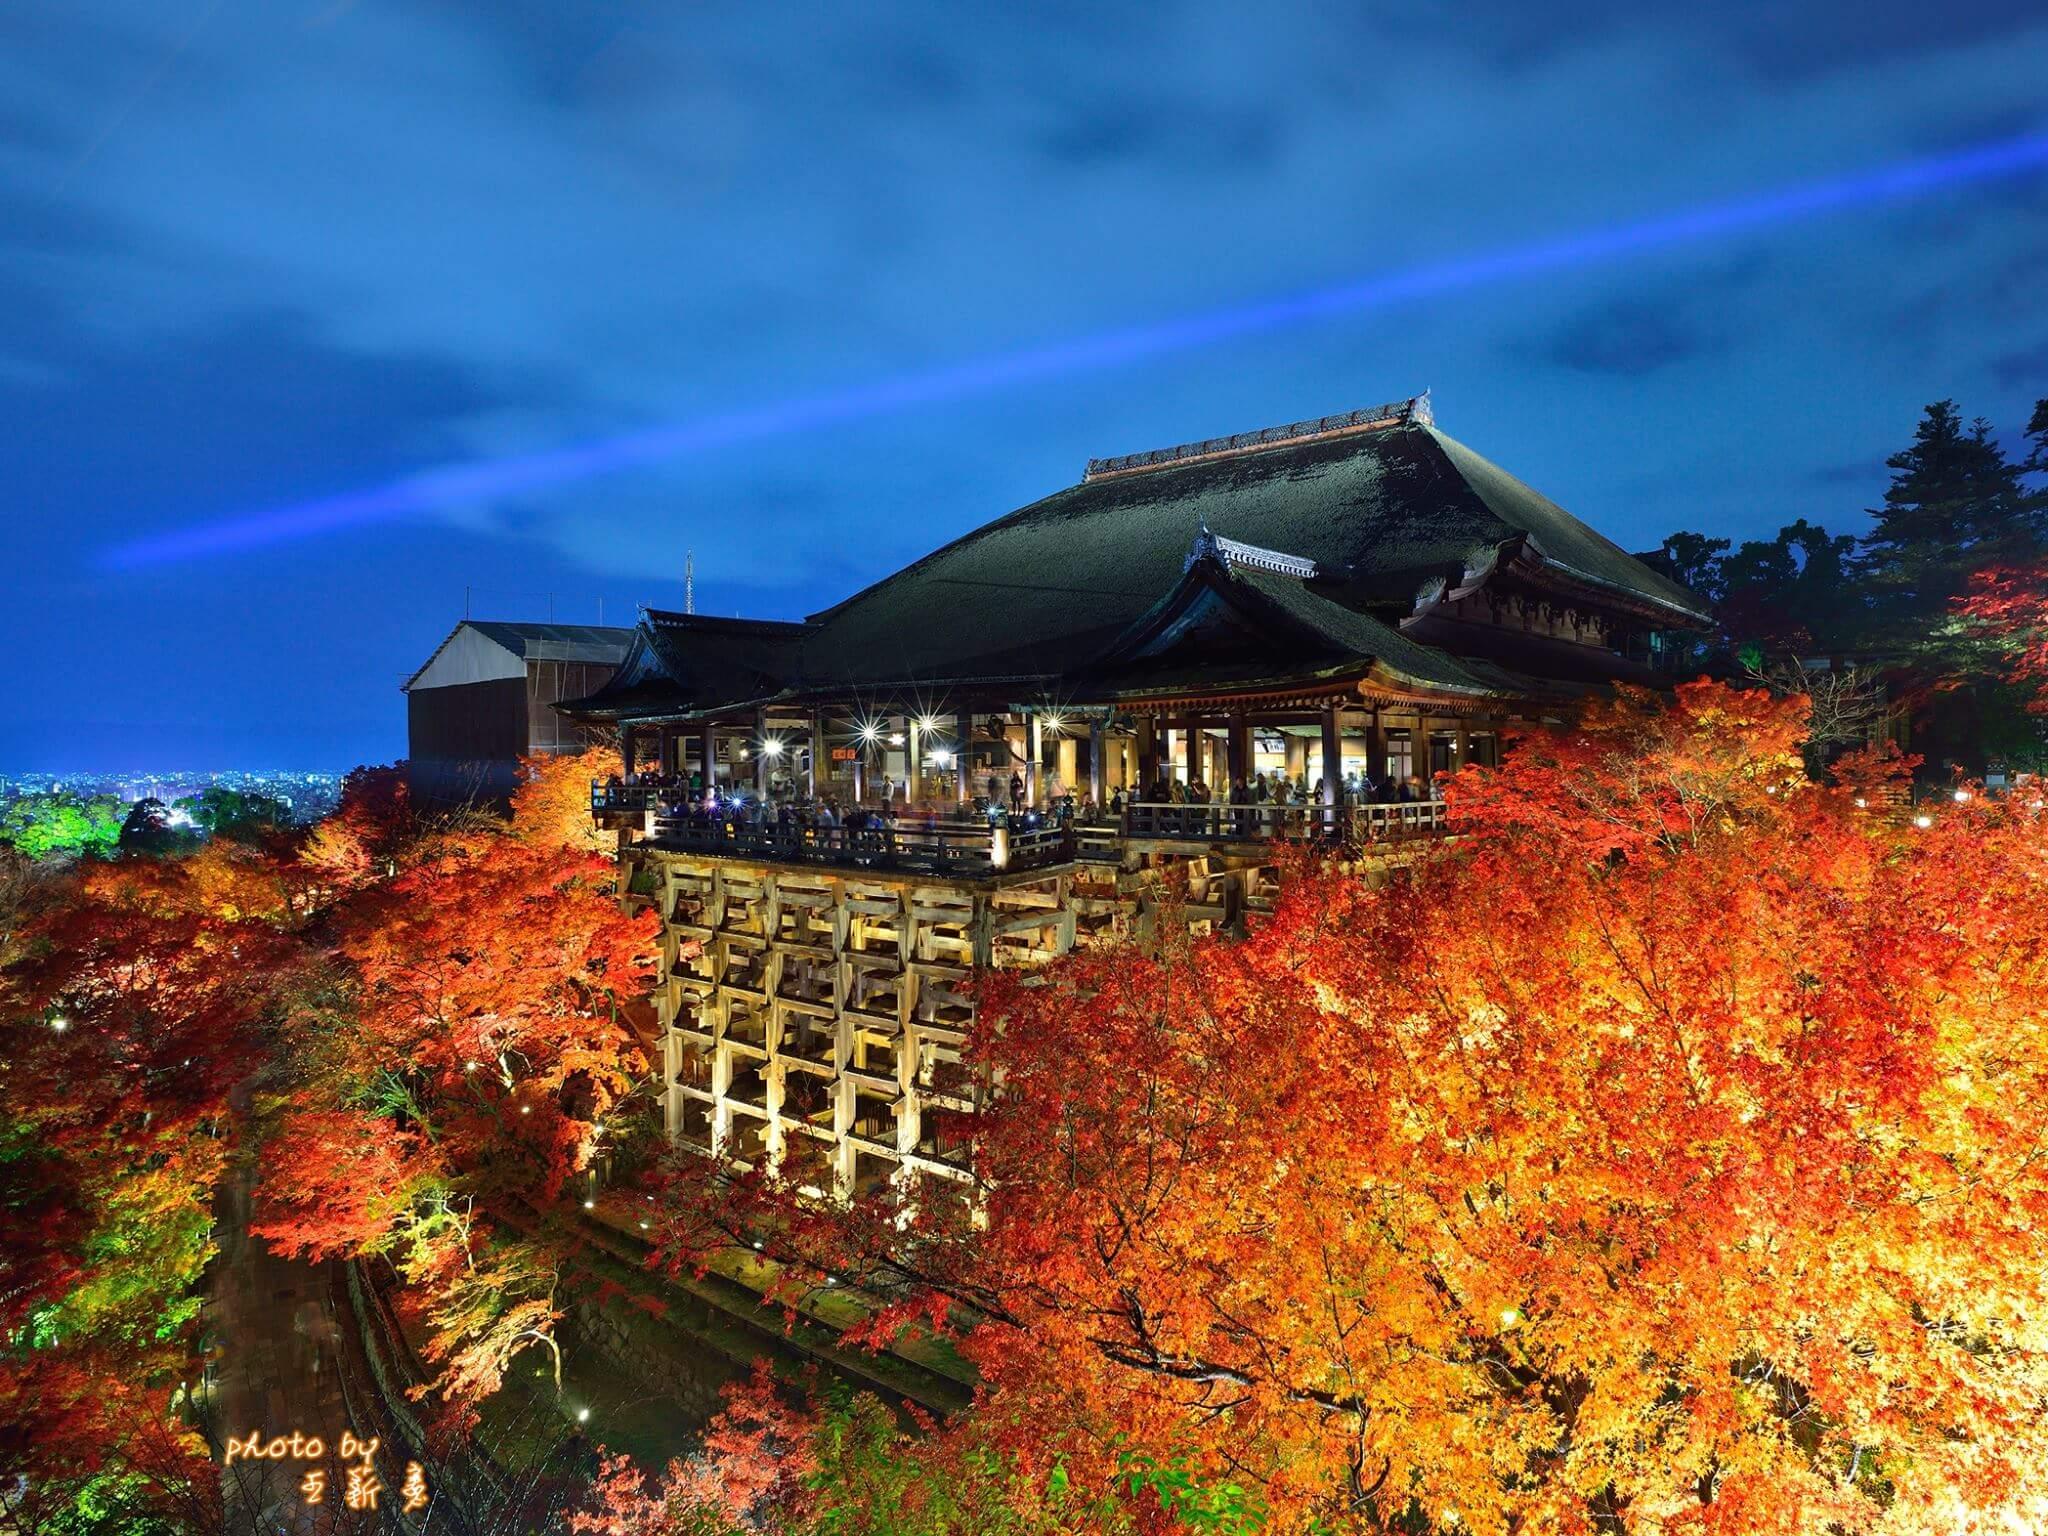 Photo of 紅葉のライトアップと清水の舞台のコラボが美しい!「清水寺・夜の特別拝観」